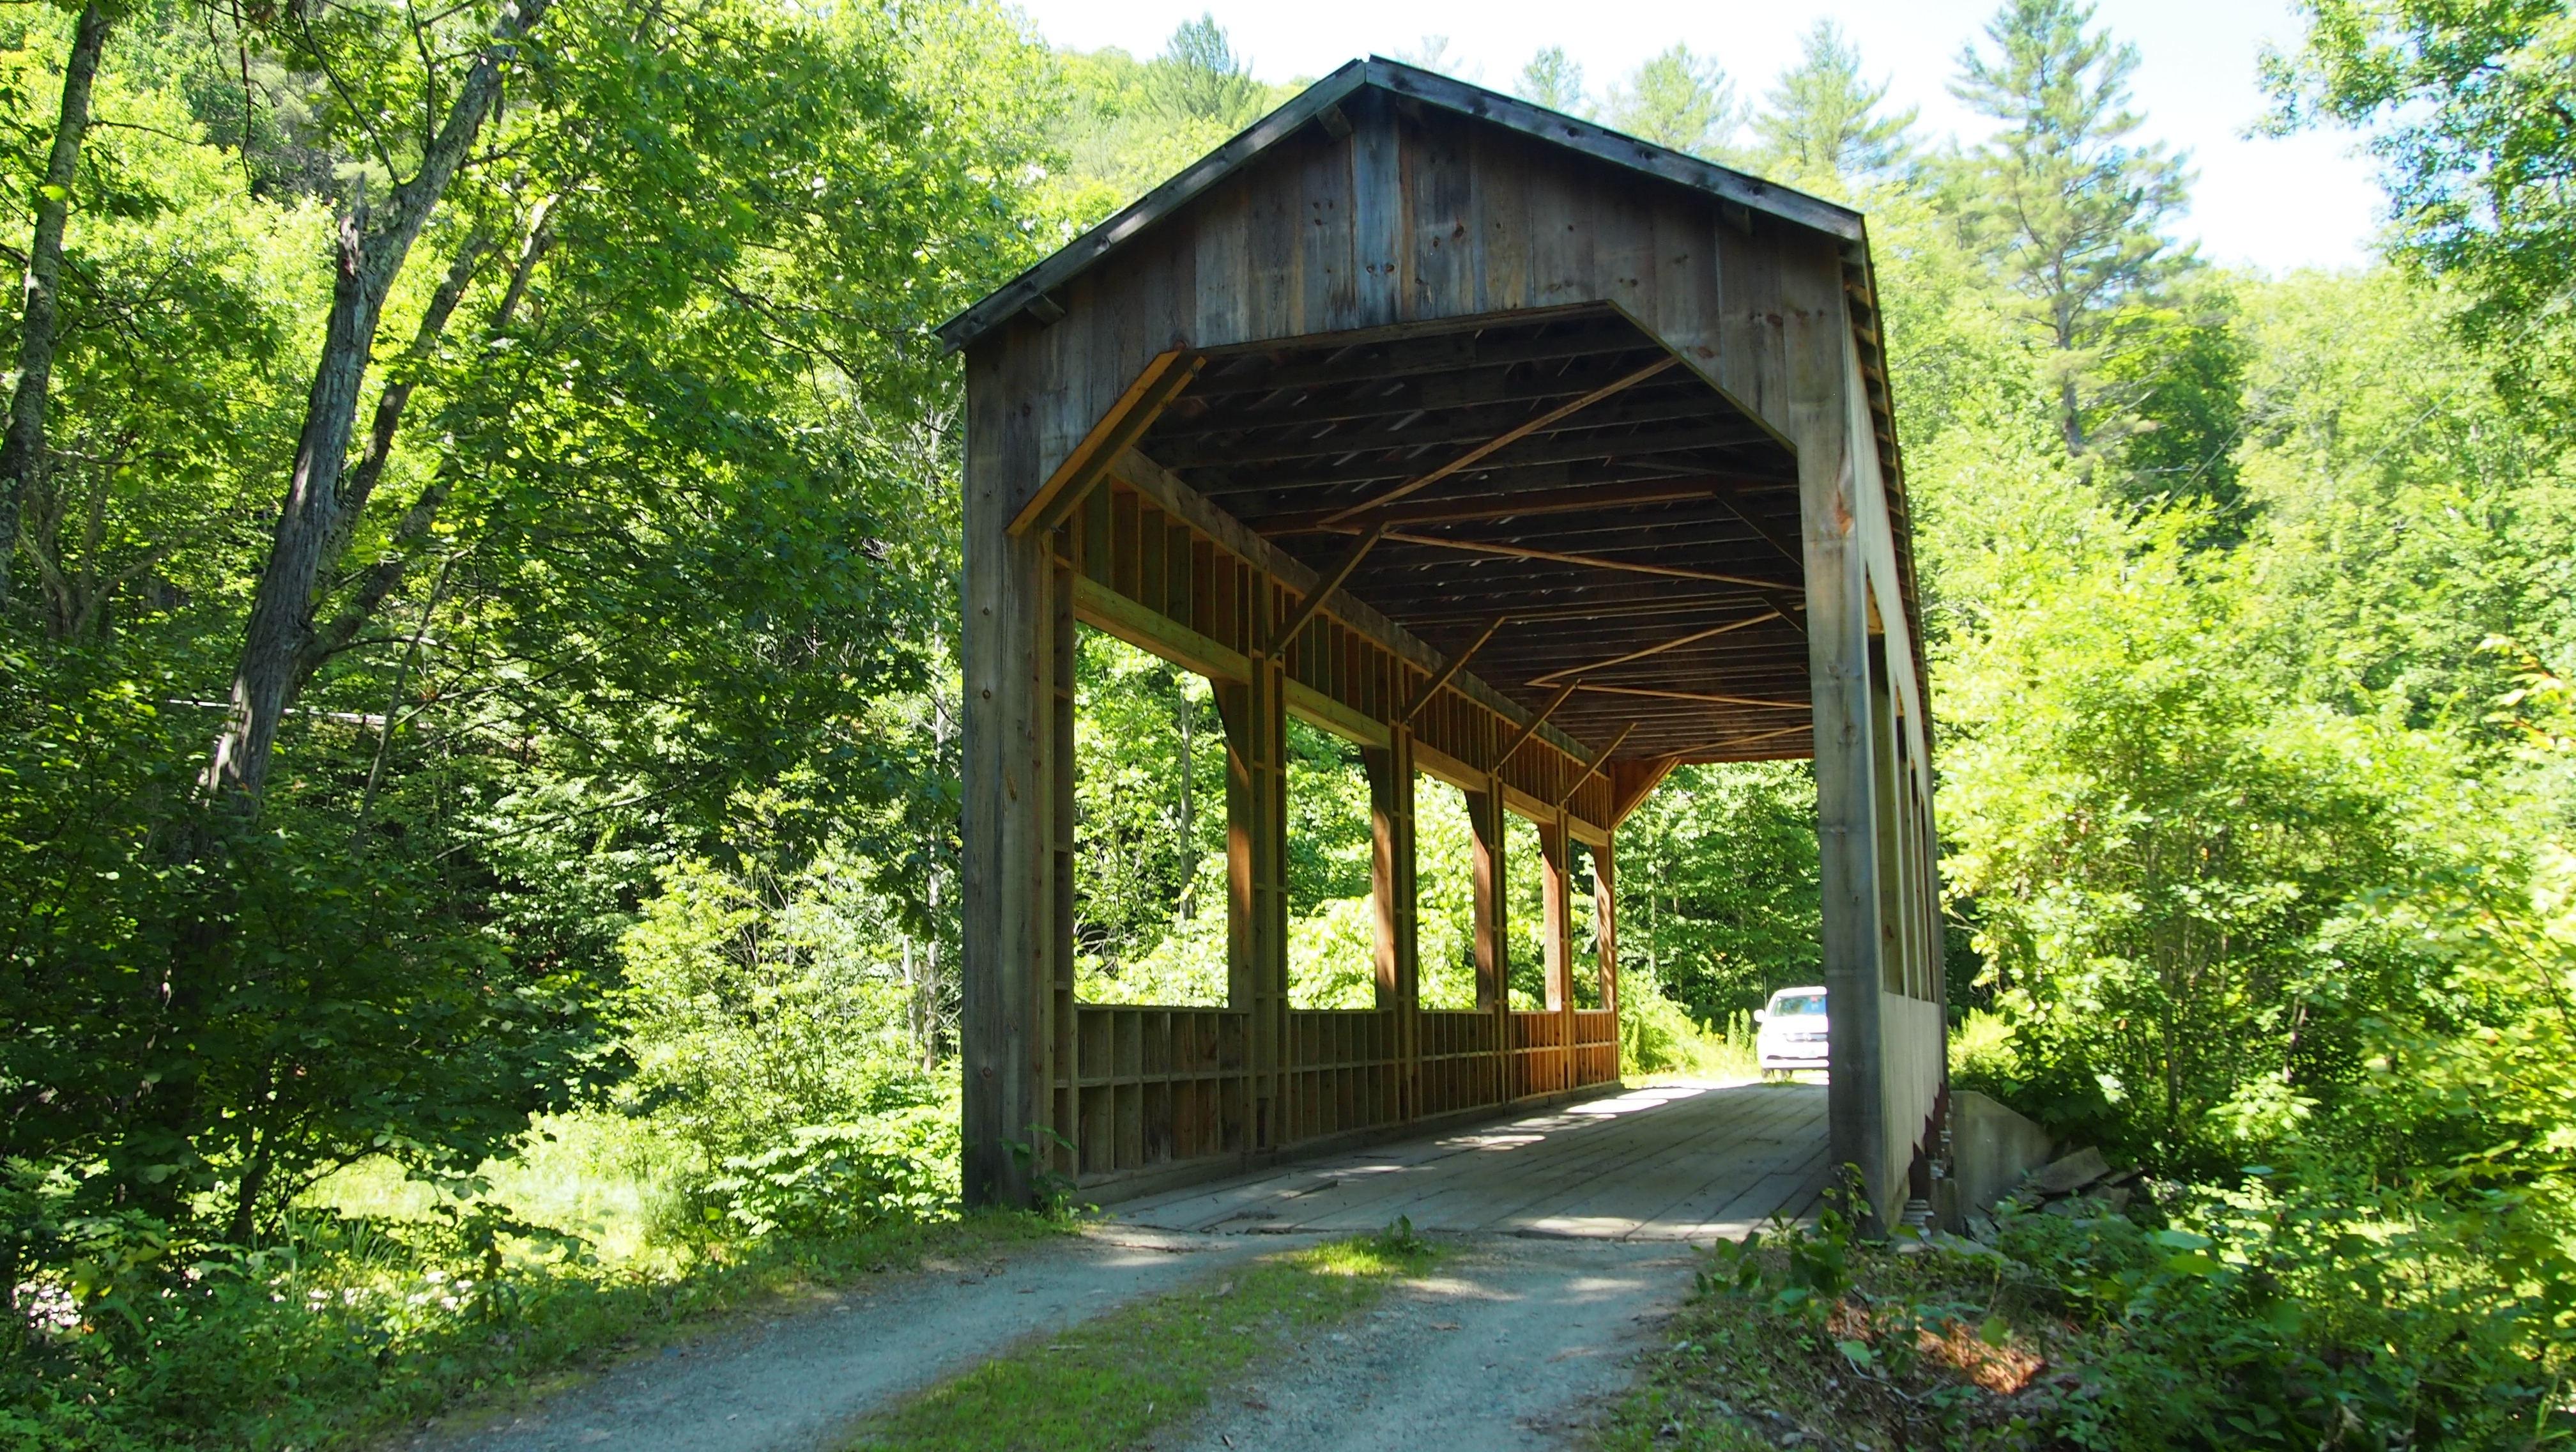 Fotos gratis : bosque, madera, puente, cobertizo, cabaña, Estados ...